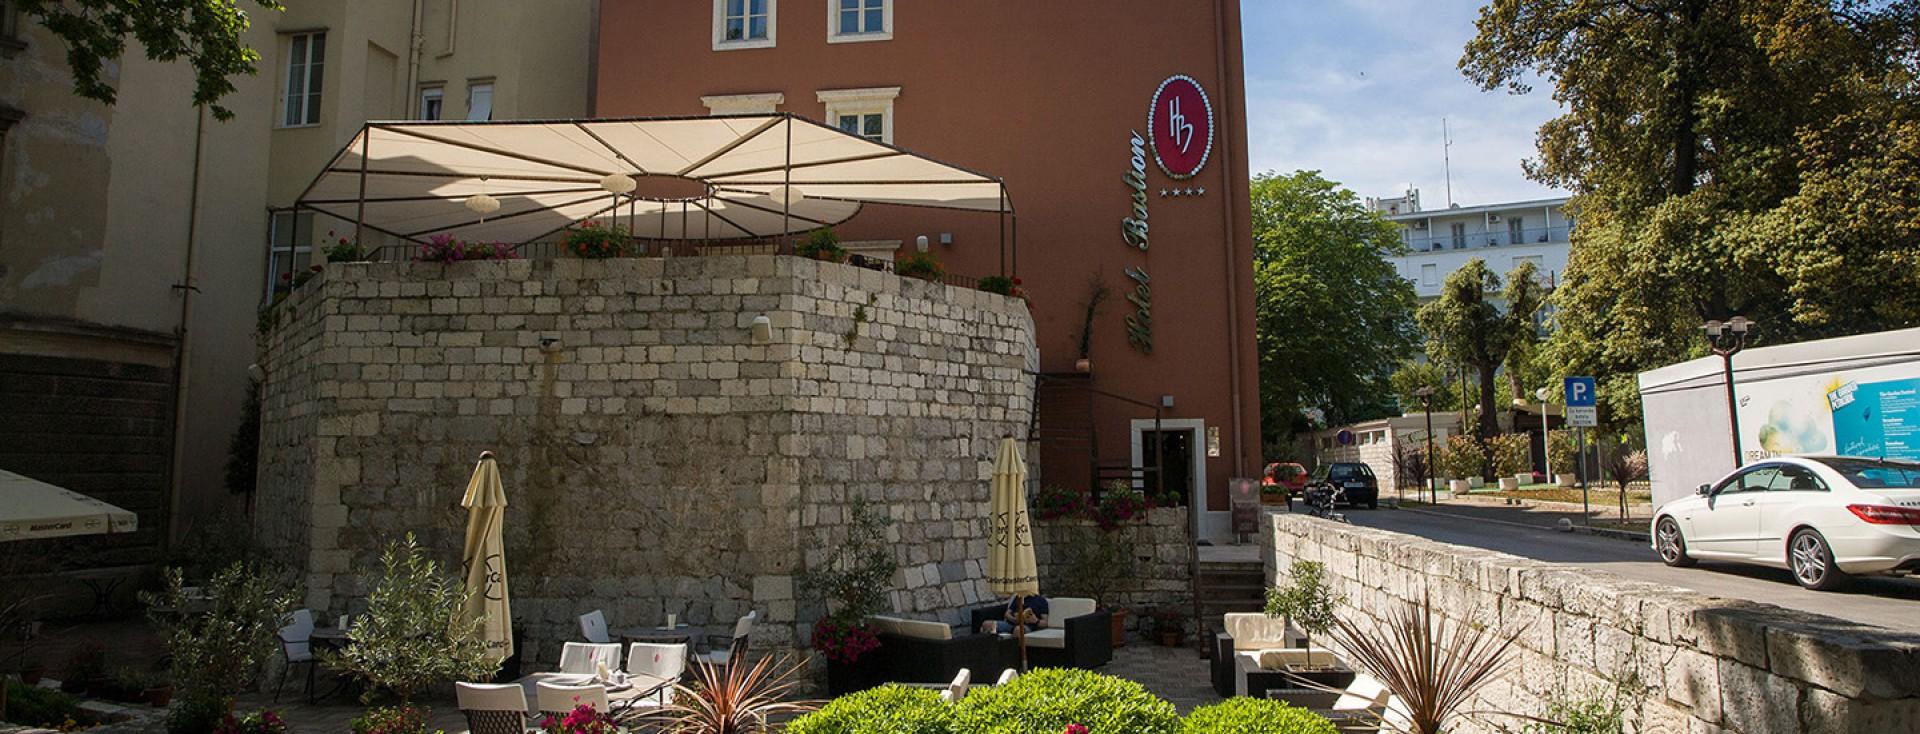 Hotel bastion zadar boutique hotel and gourmet restaurant for Best boutique hotels in zadar